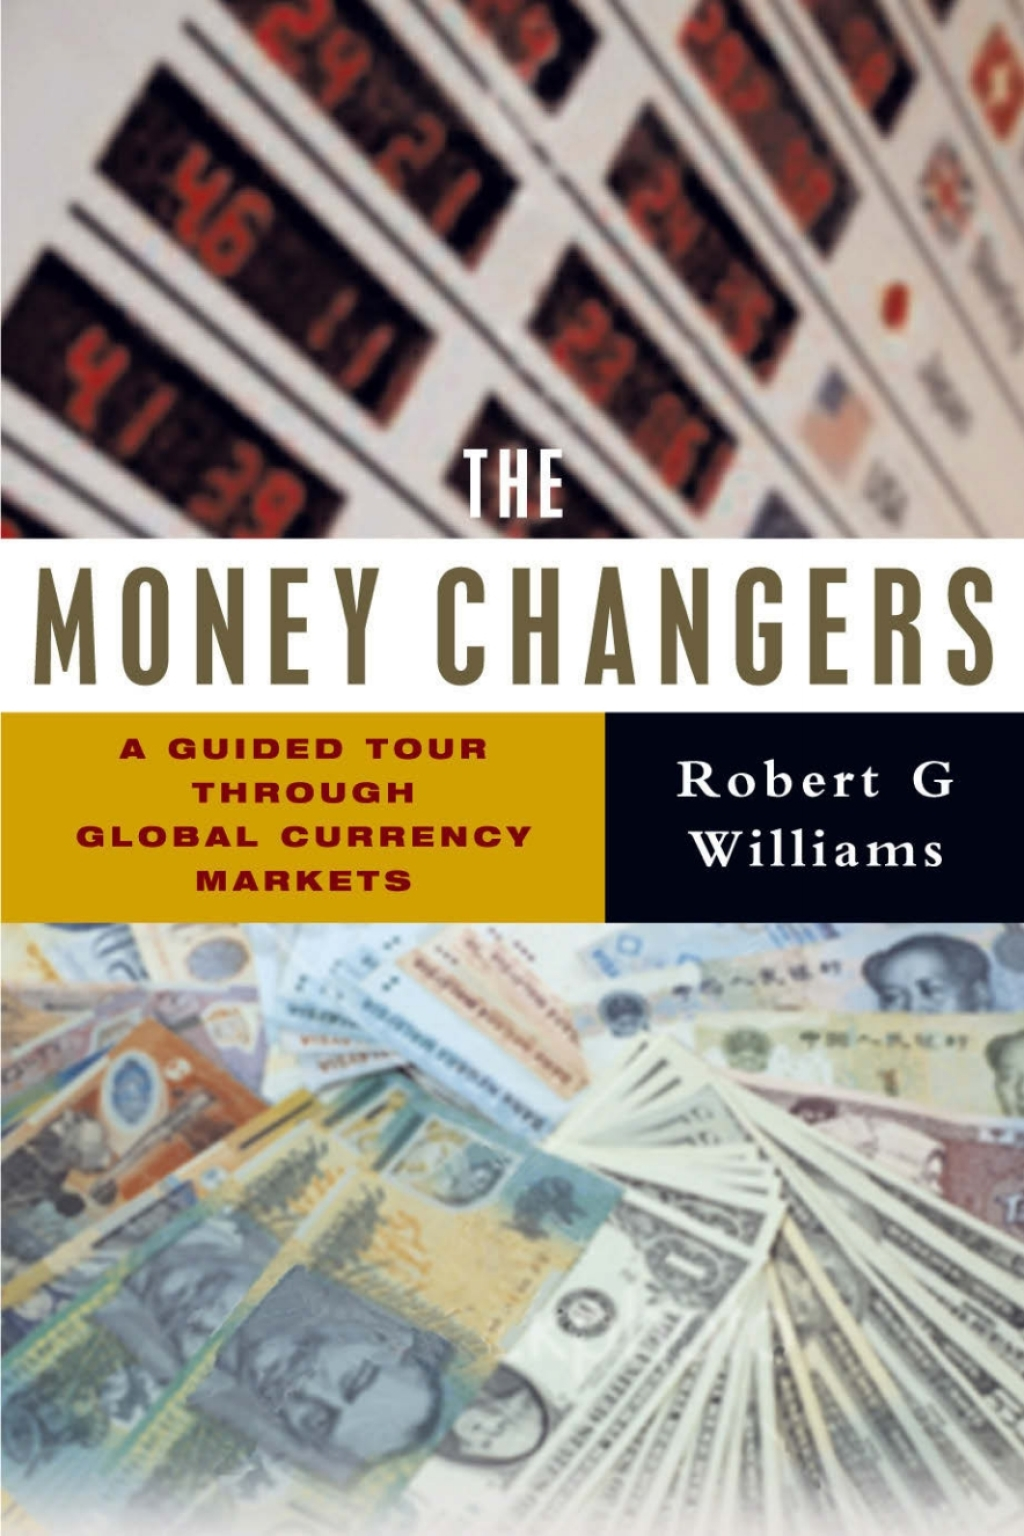 The Money Changers (eBook) (9781848130739) photo